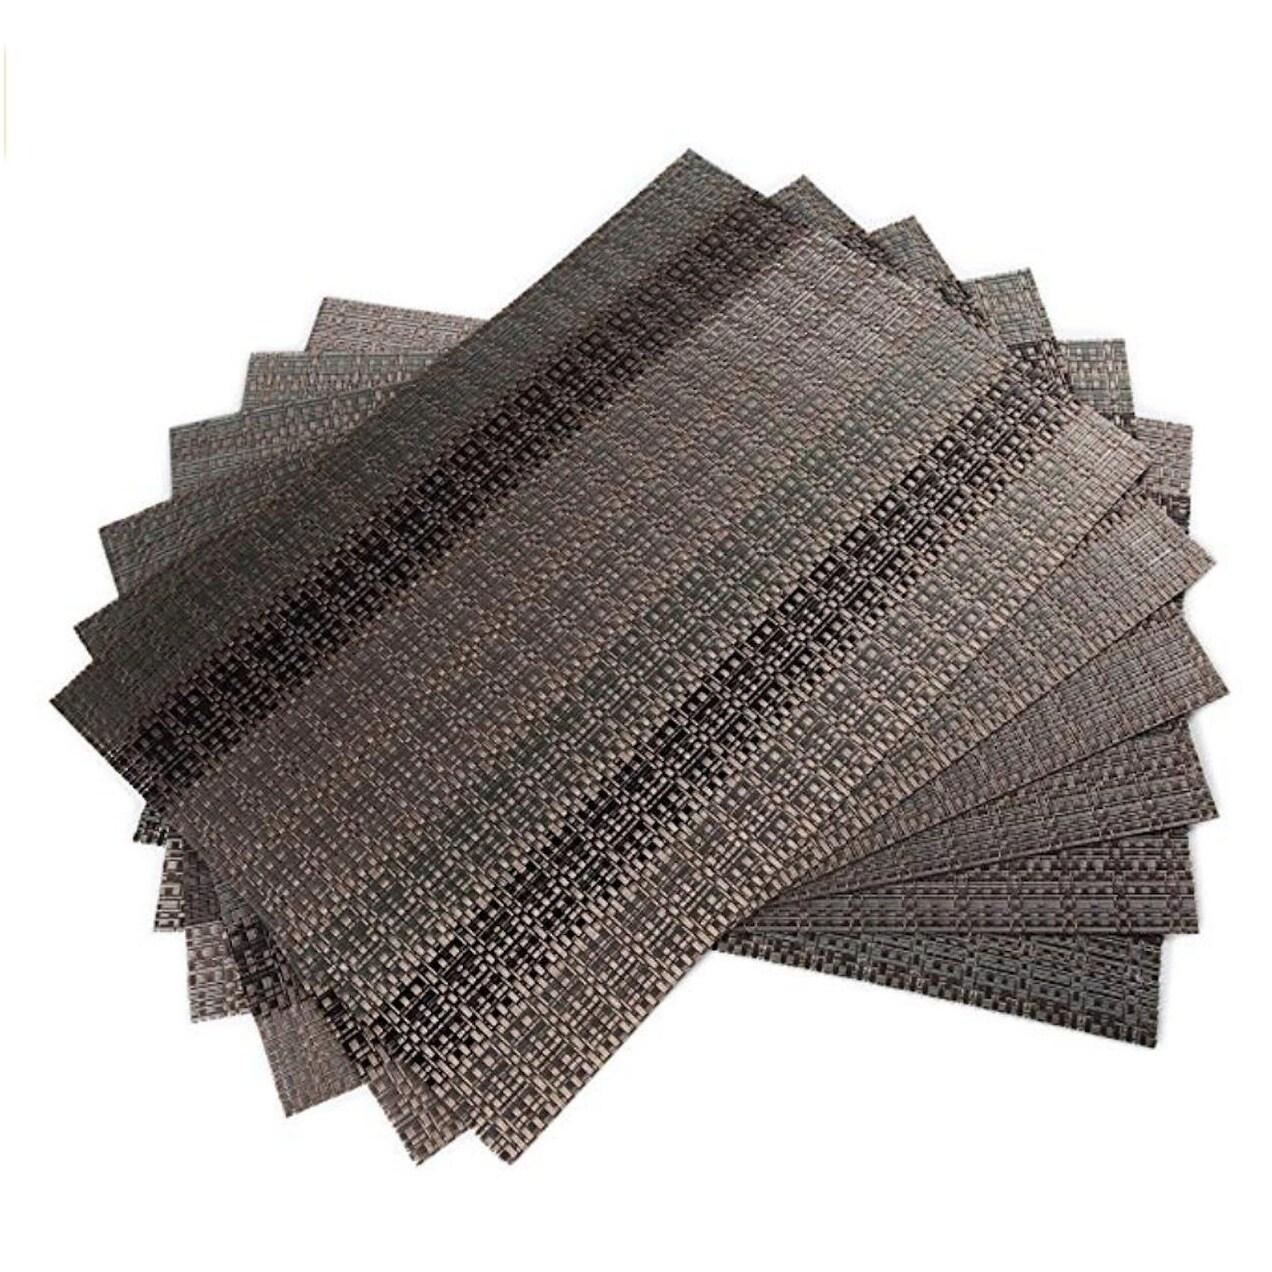 Soft Crossweave Woven Vinyl Placemat Set of 6 Brown 18 x 12